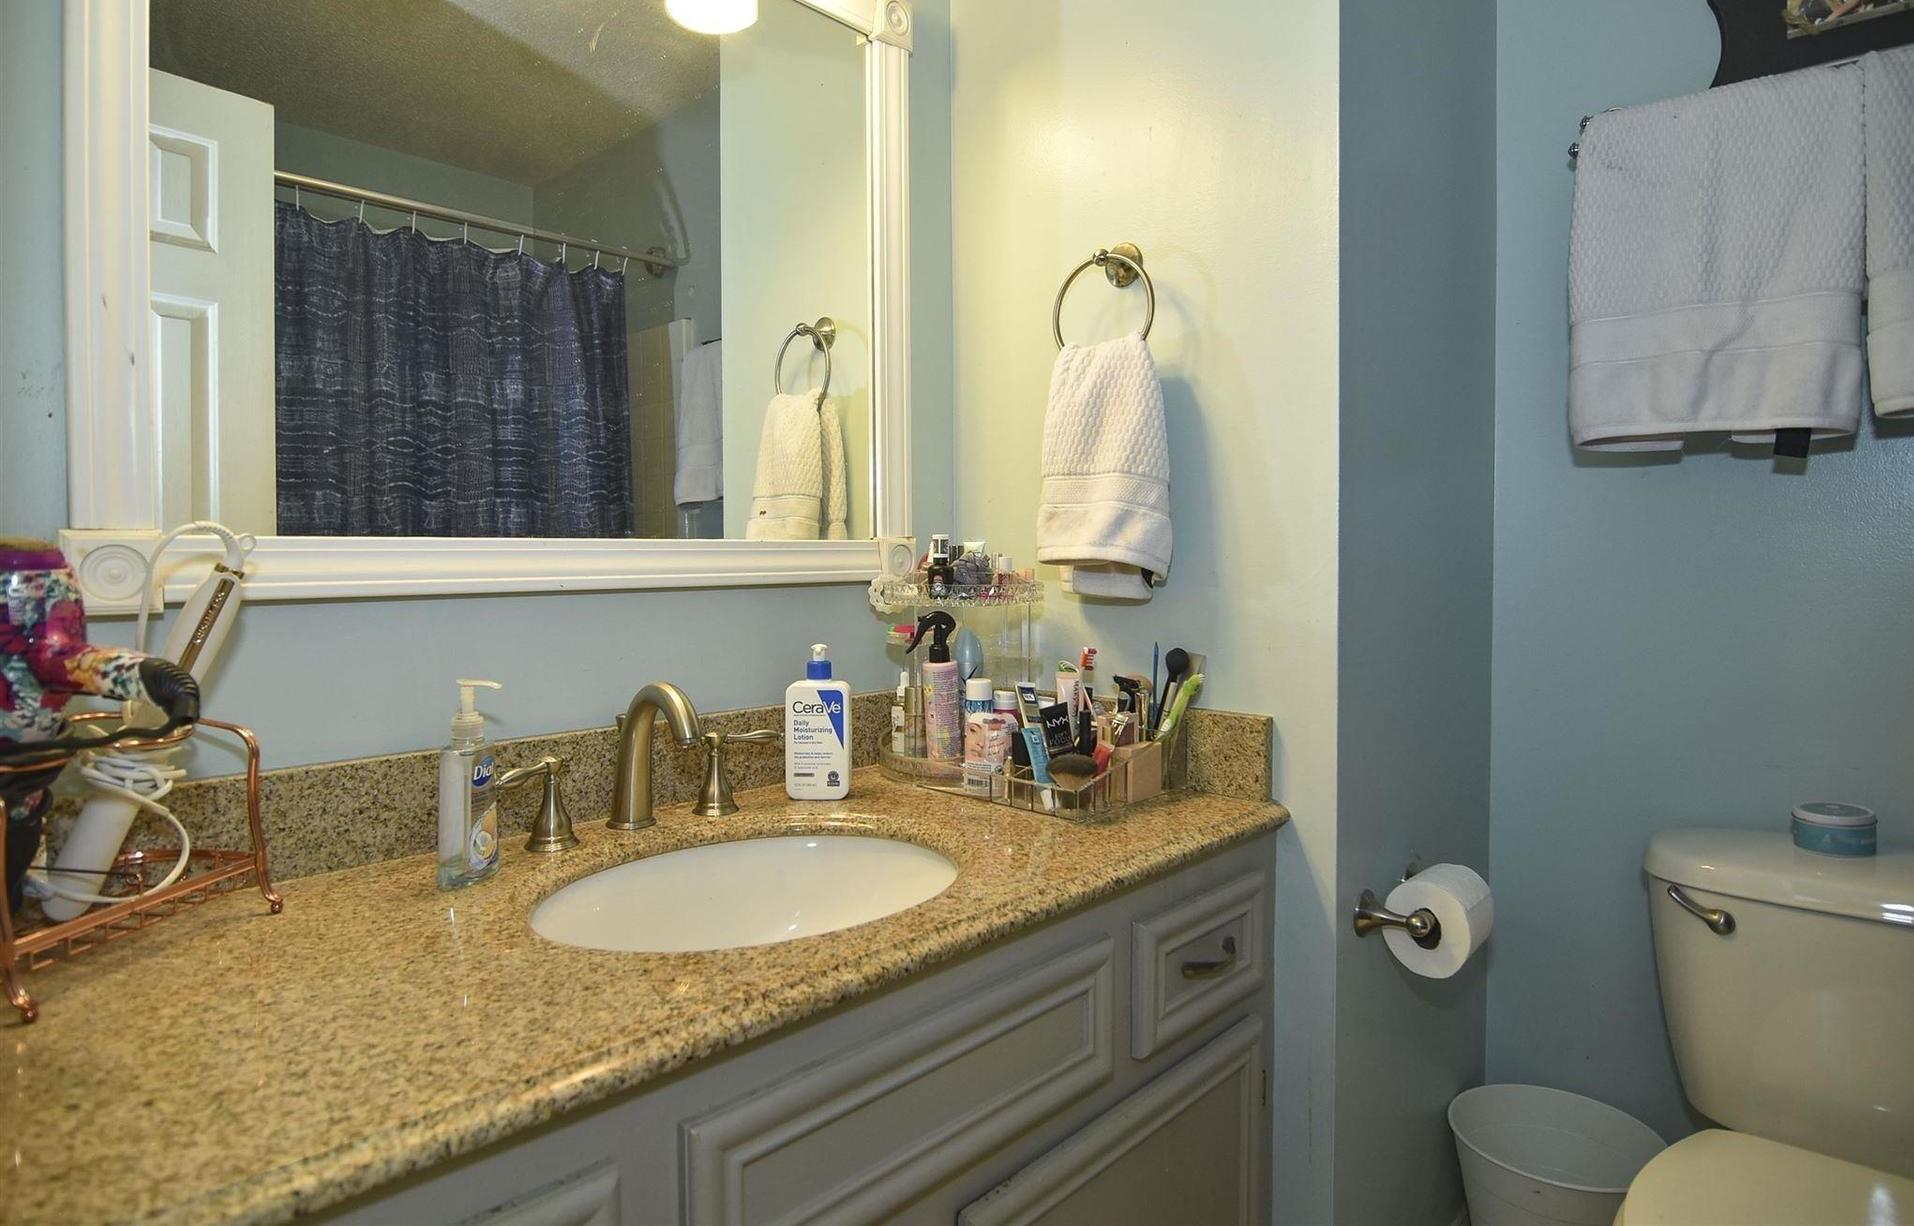 4021 Hickory Street,Columbia,South Carolina 29205,3 Bedrooms Bedrooms,2 BathroomsBathrooms,Home,Hickory Street,1387